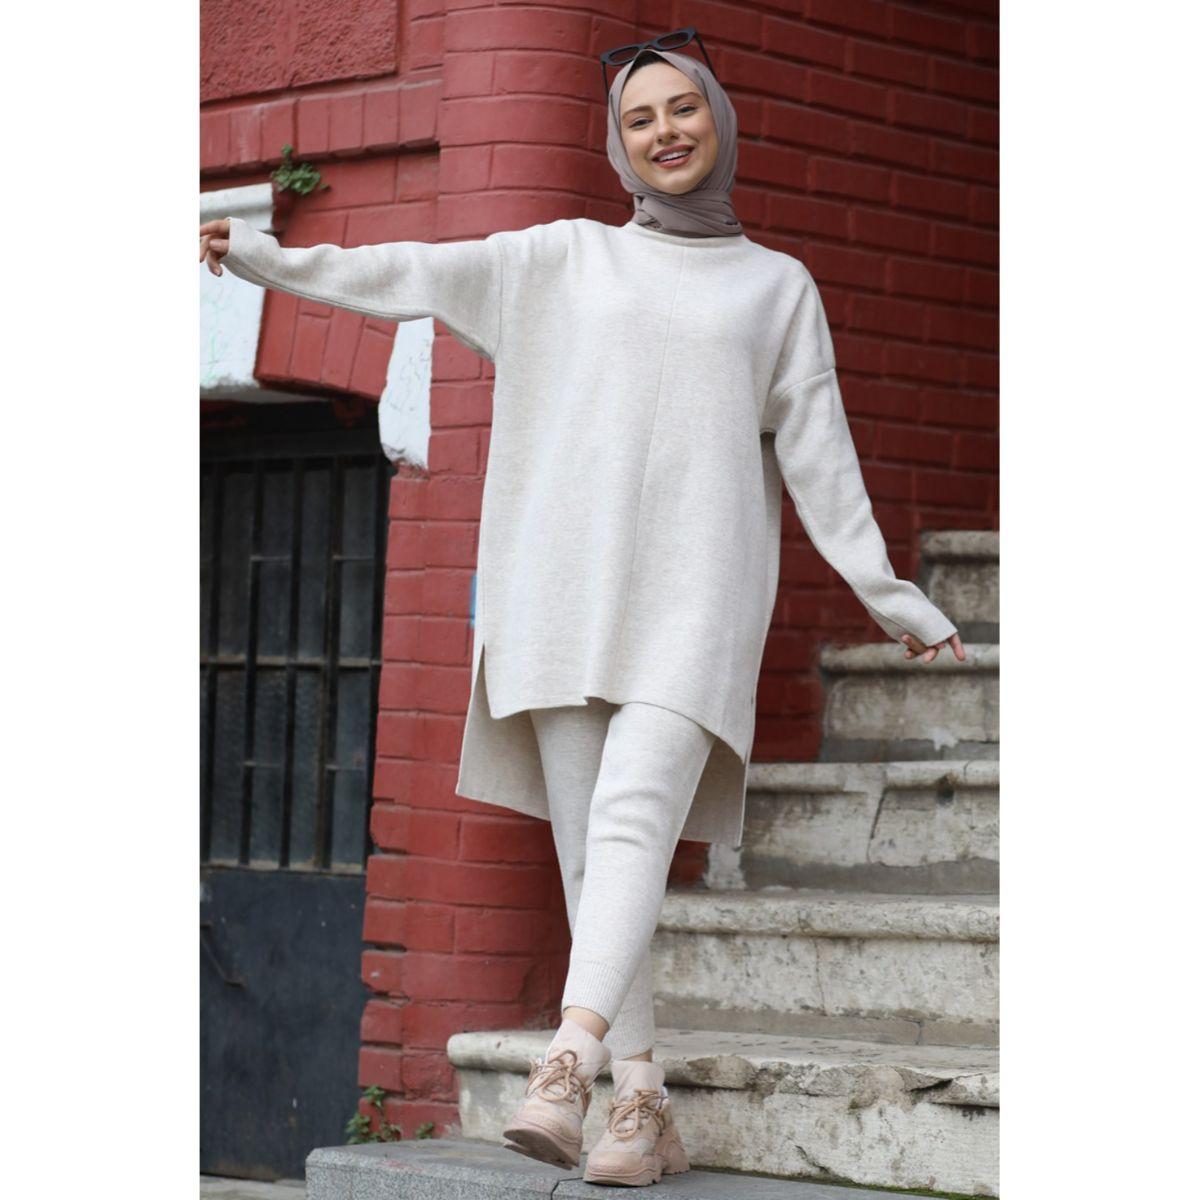 Tight Leg Knitwear Team Sports set outfit for Muslim women Hijab İslamic Clothing young Muslim women's style Dubai Turkey 2021